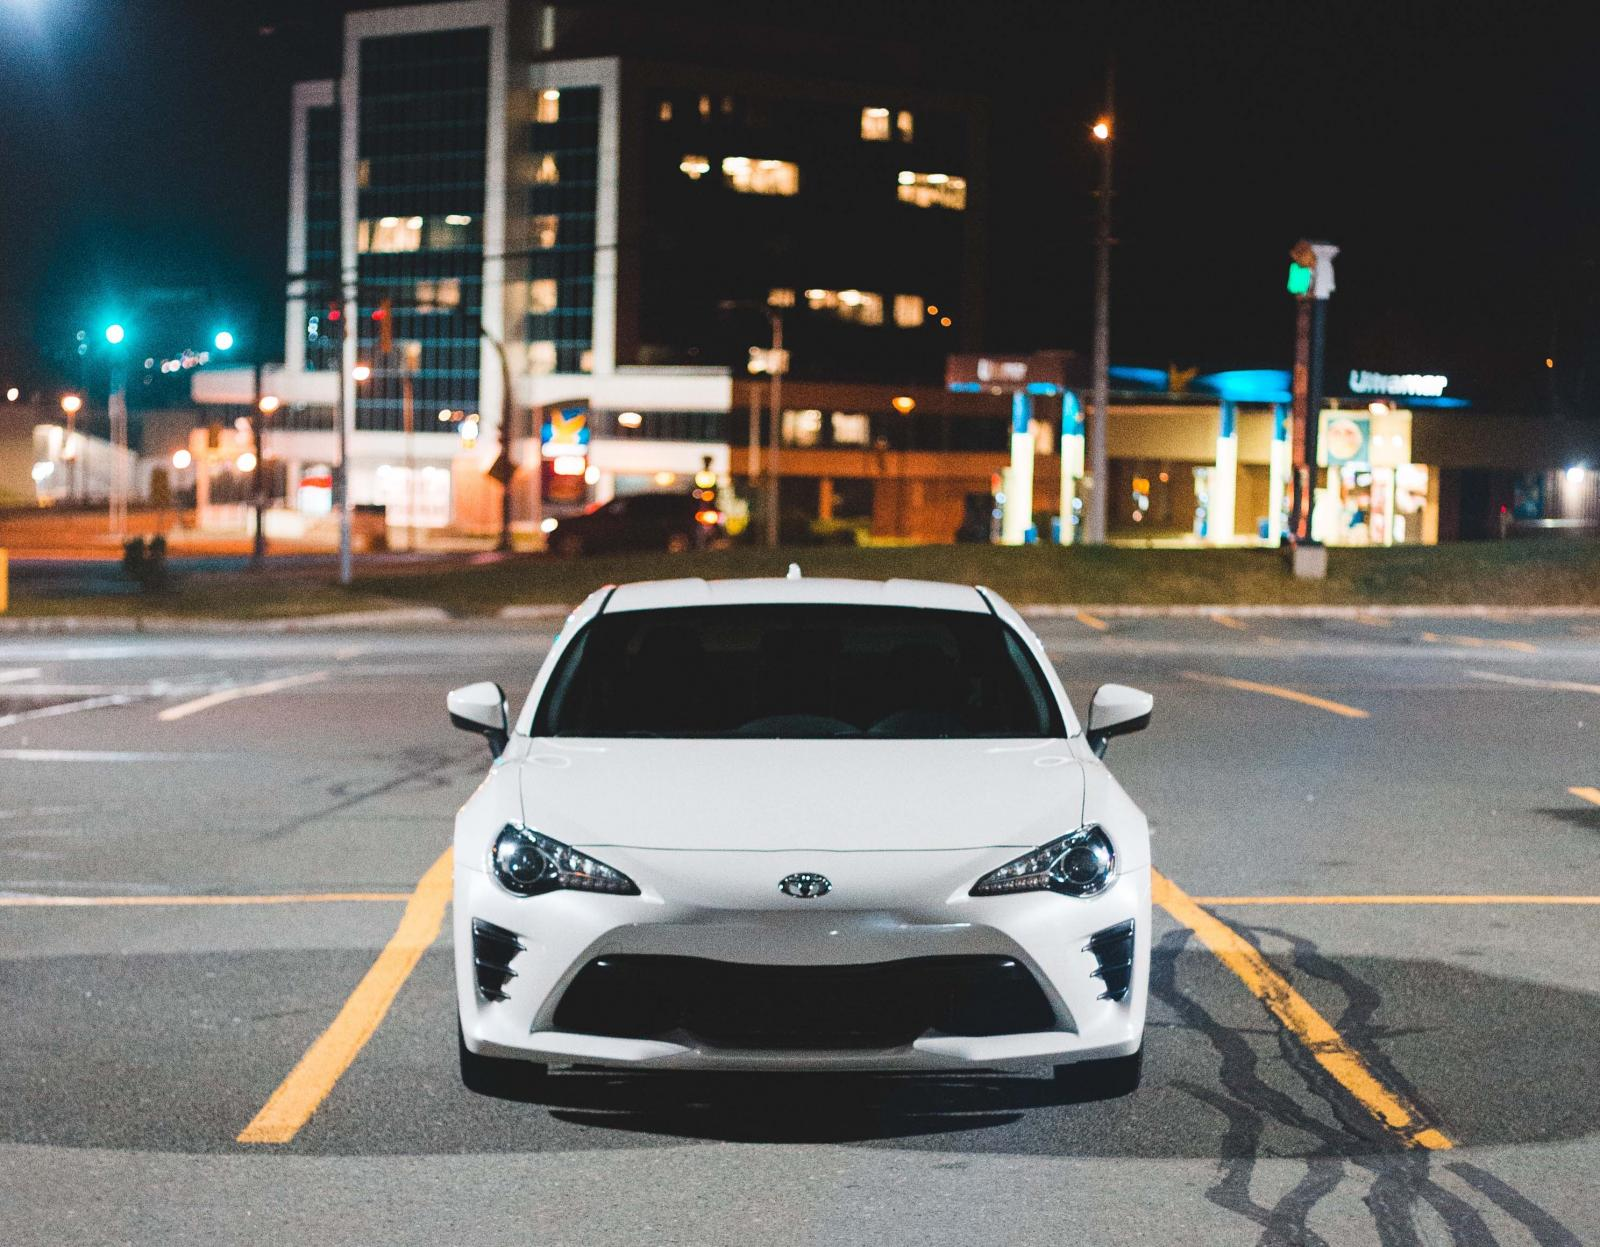 Arrendar un auto, auto de color blanco